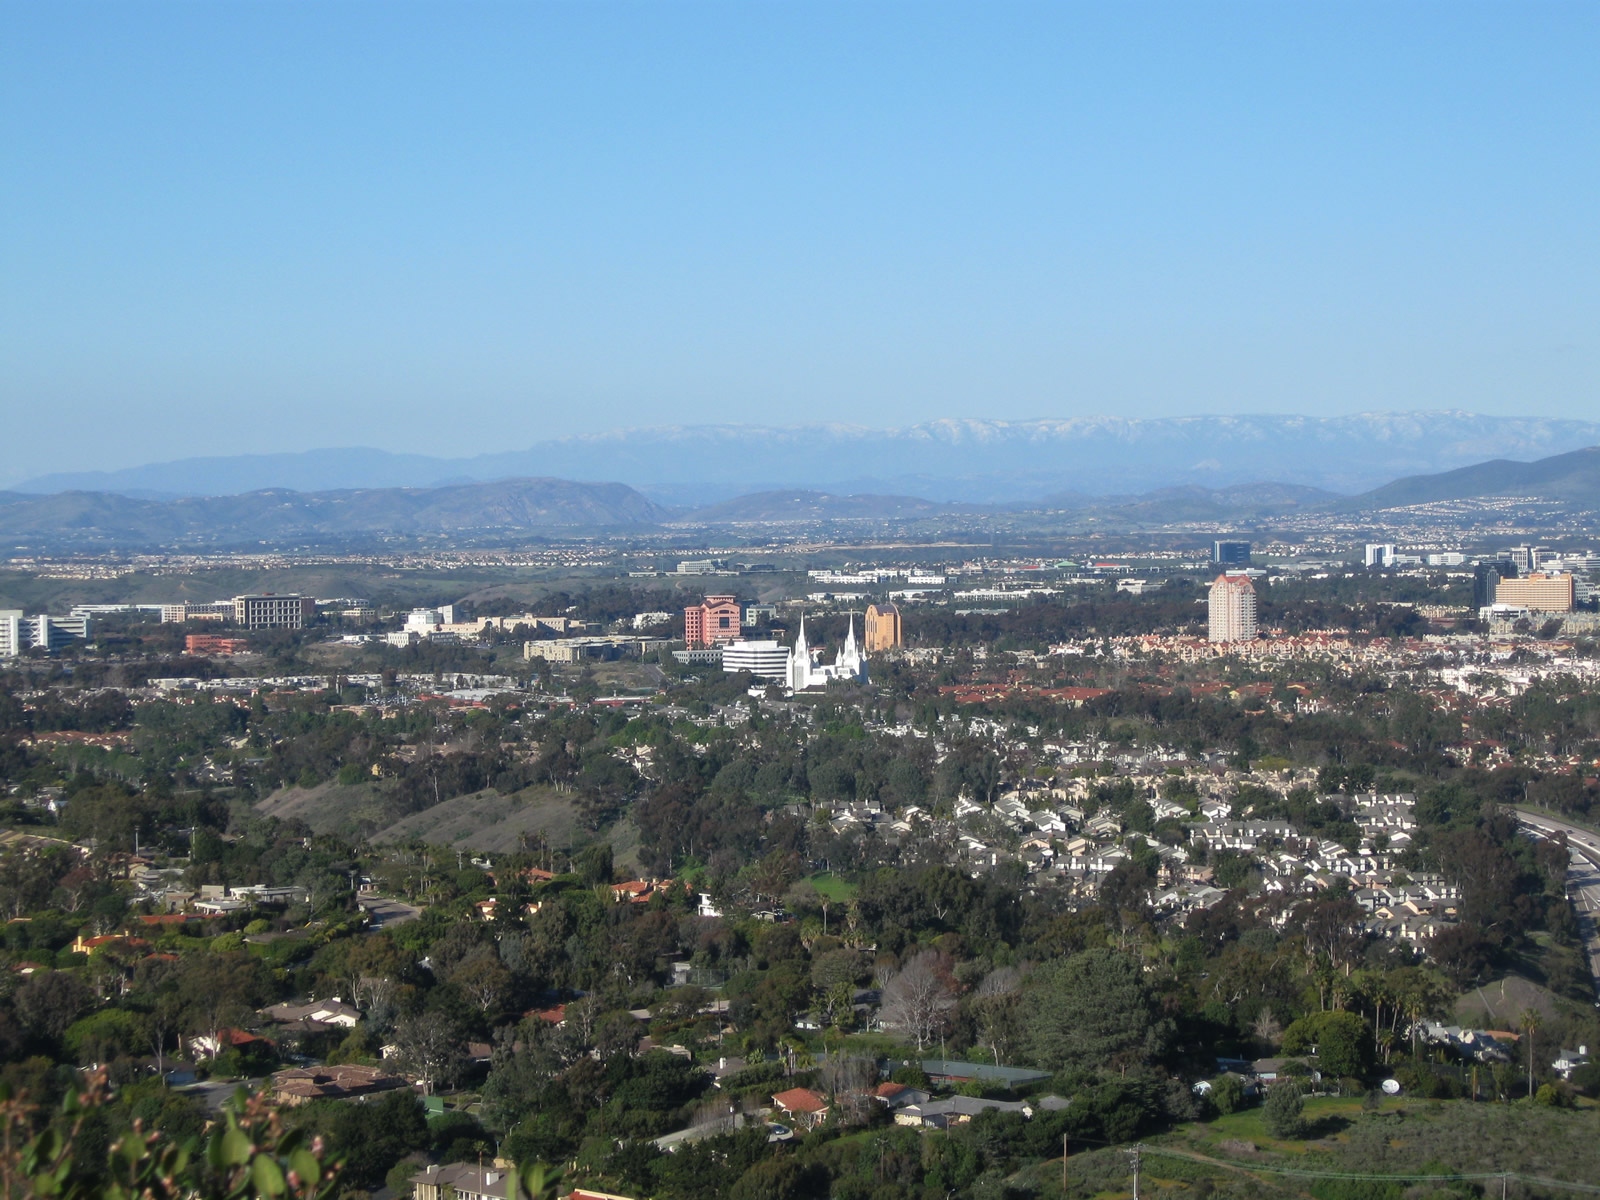 interstate 5 aaroads california highways